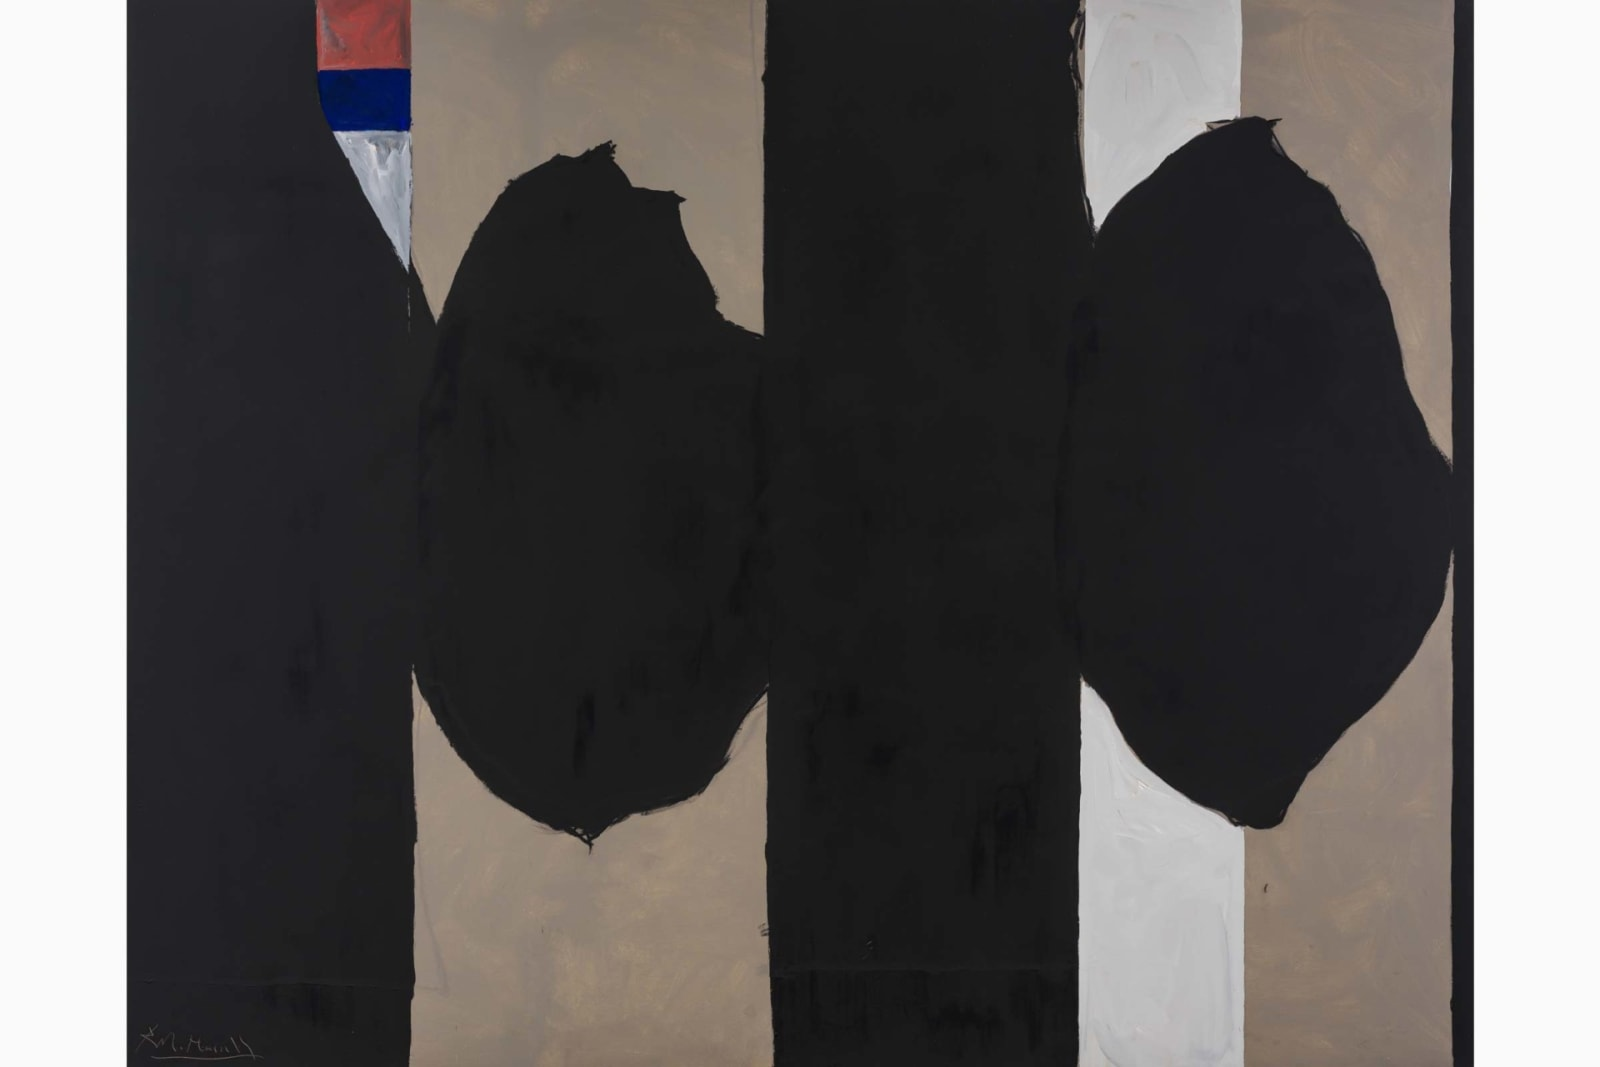 Elegy to the Spanish Republic No.130, 1974-1975, Acrylic on Canvas, 243.8 x 304.8 cm